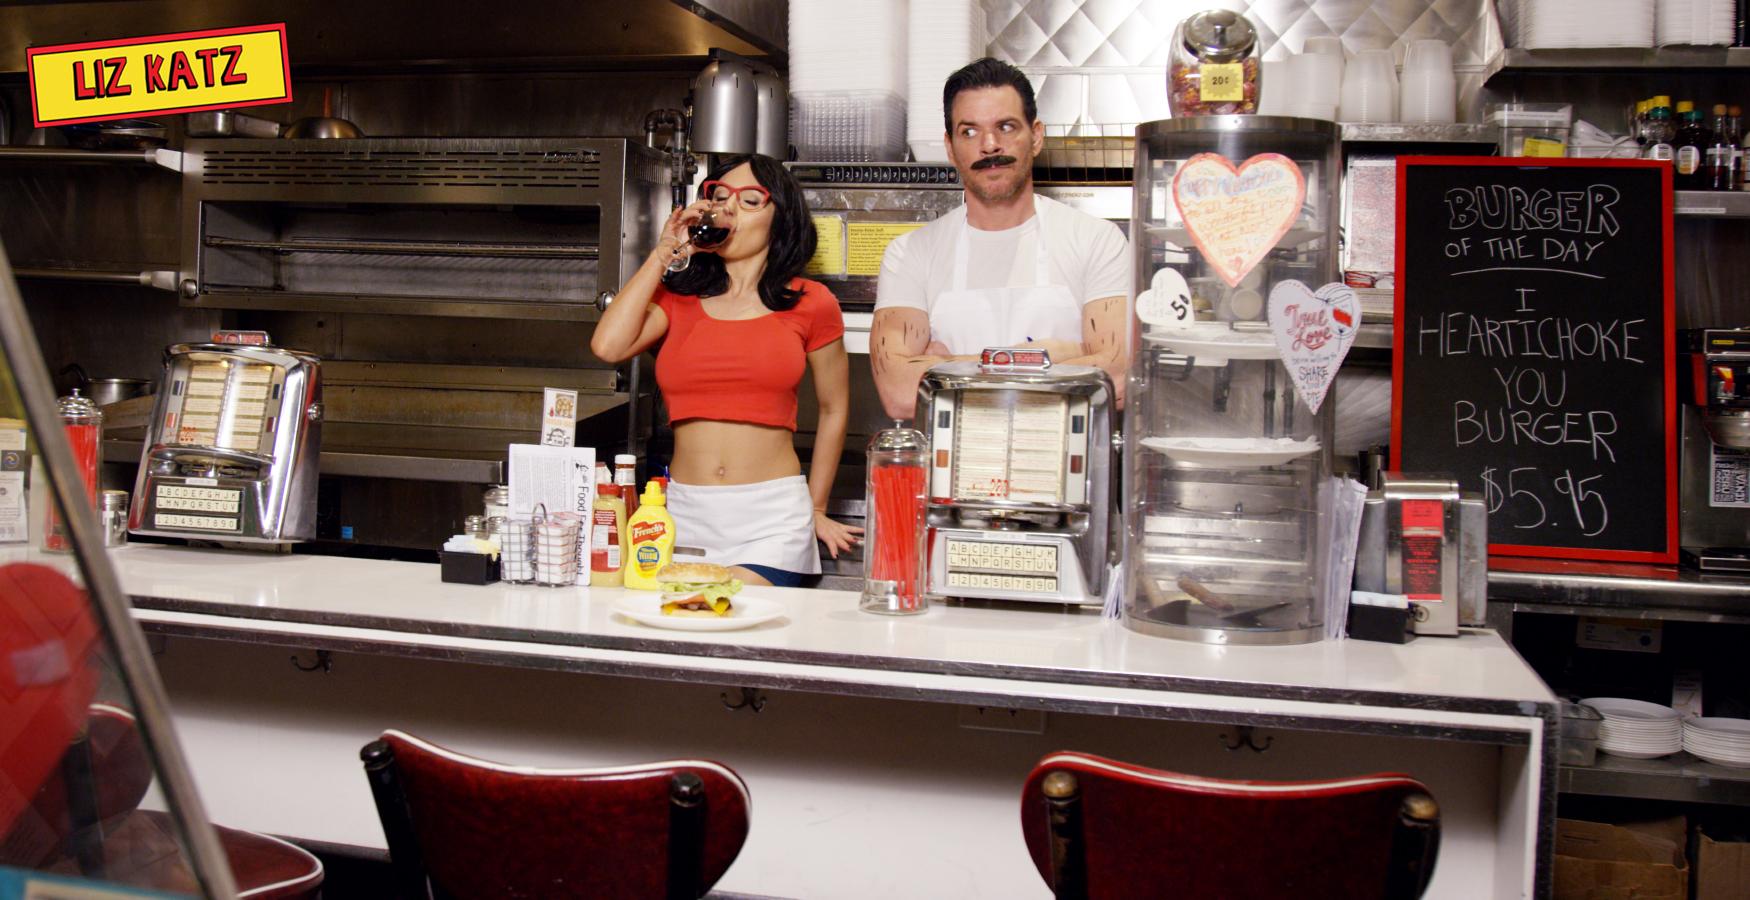 Liz Katz Bobs Burgers Cosplay I Heartichoke You Liz Katz